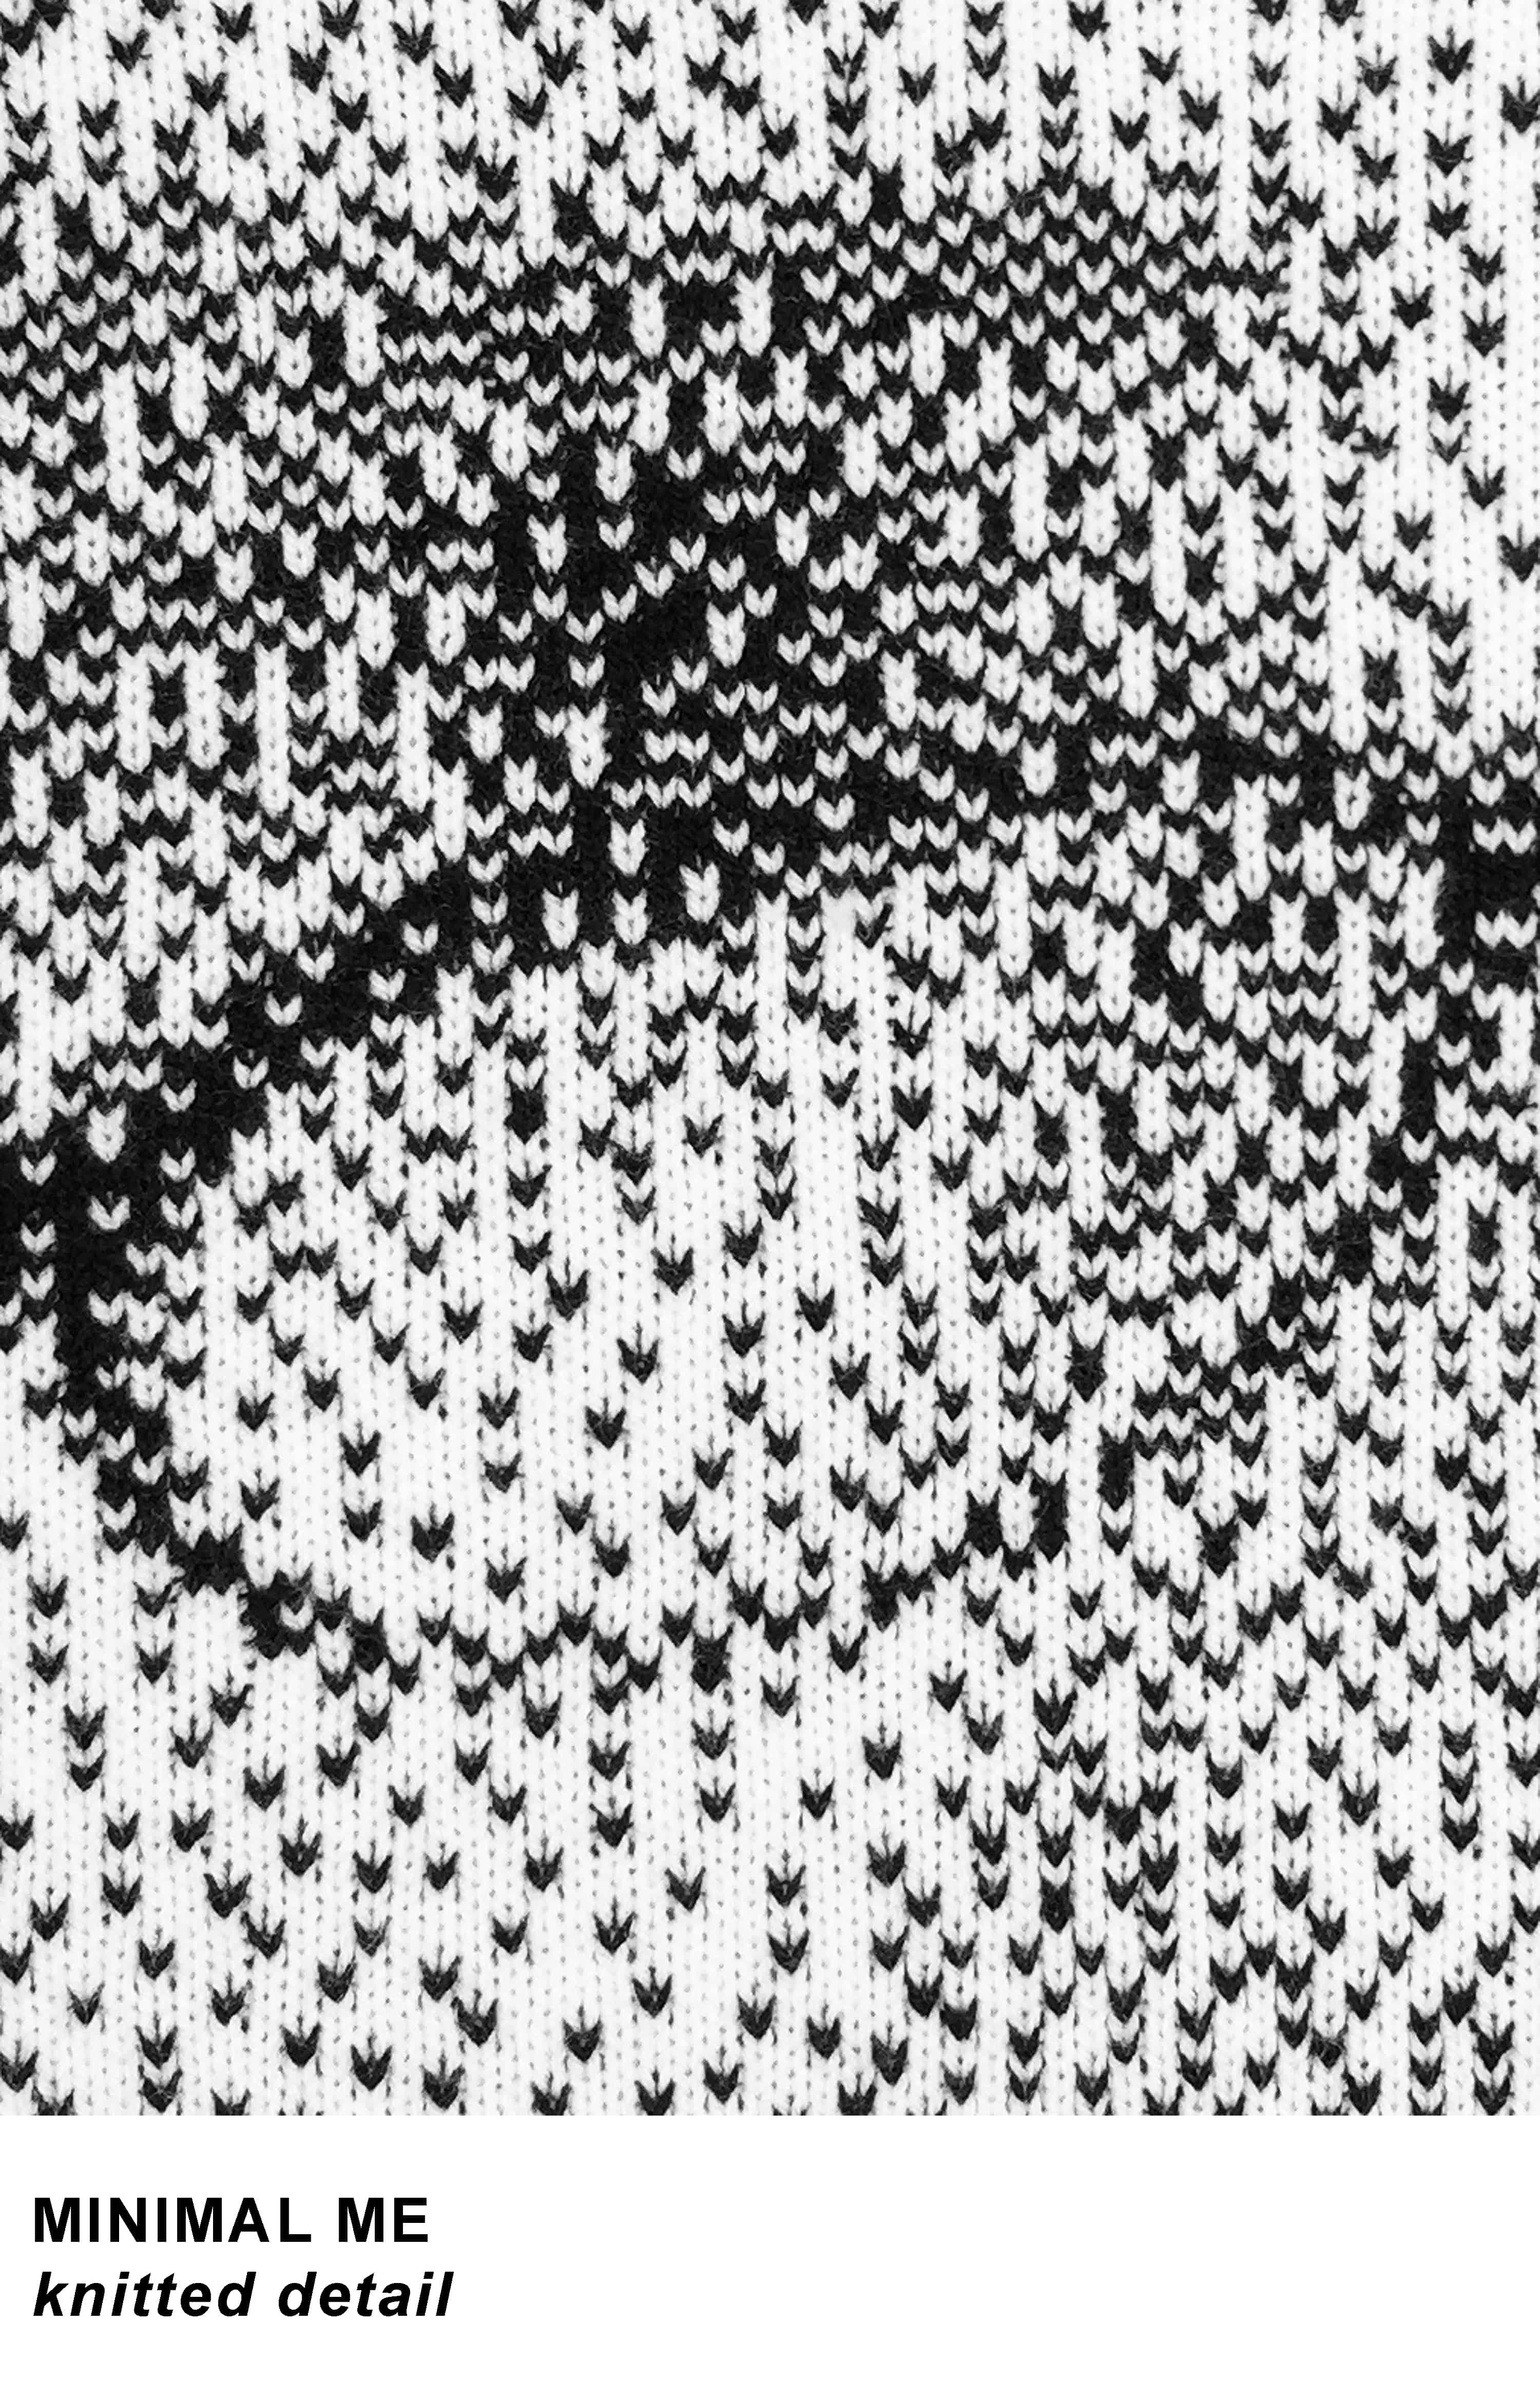 MINIMAL knitted detail portfolio